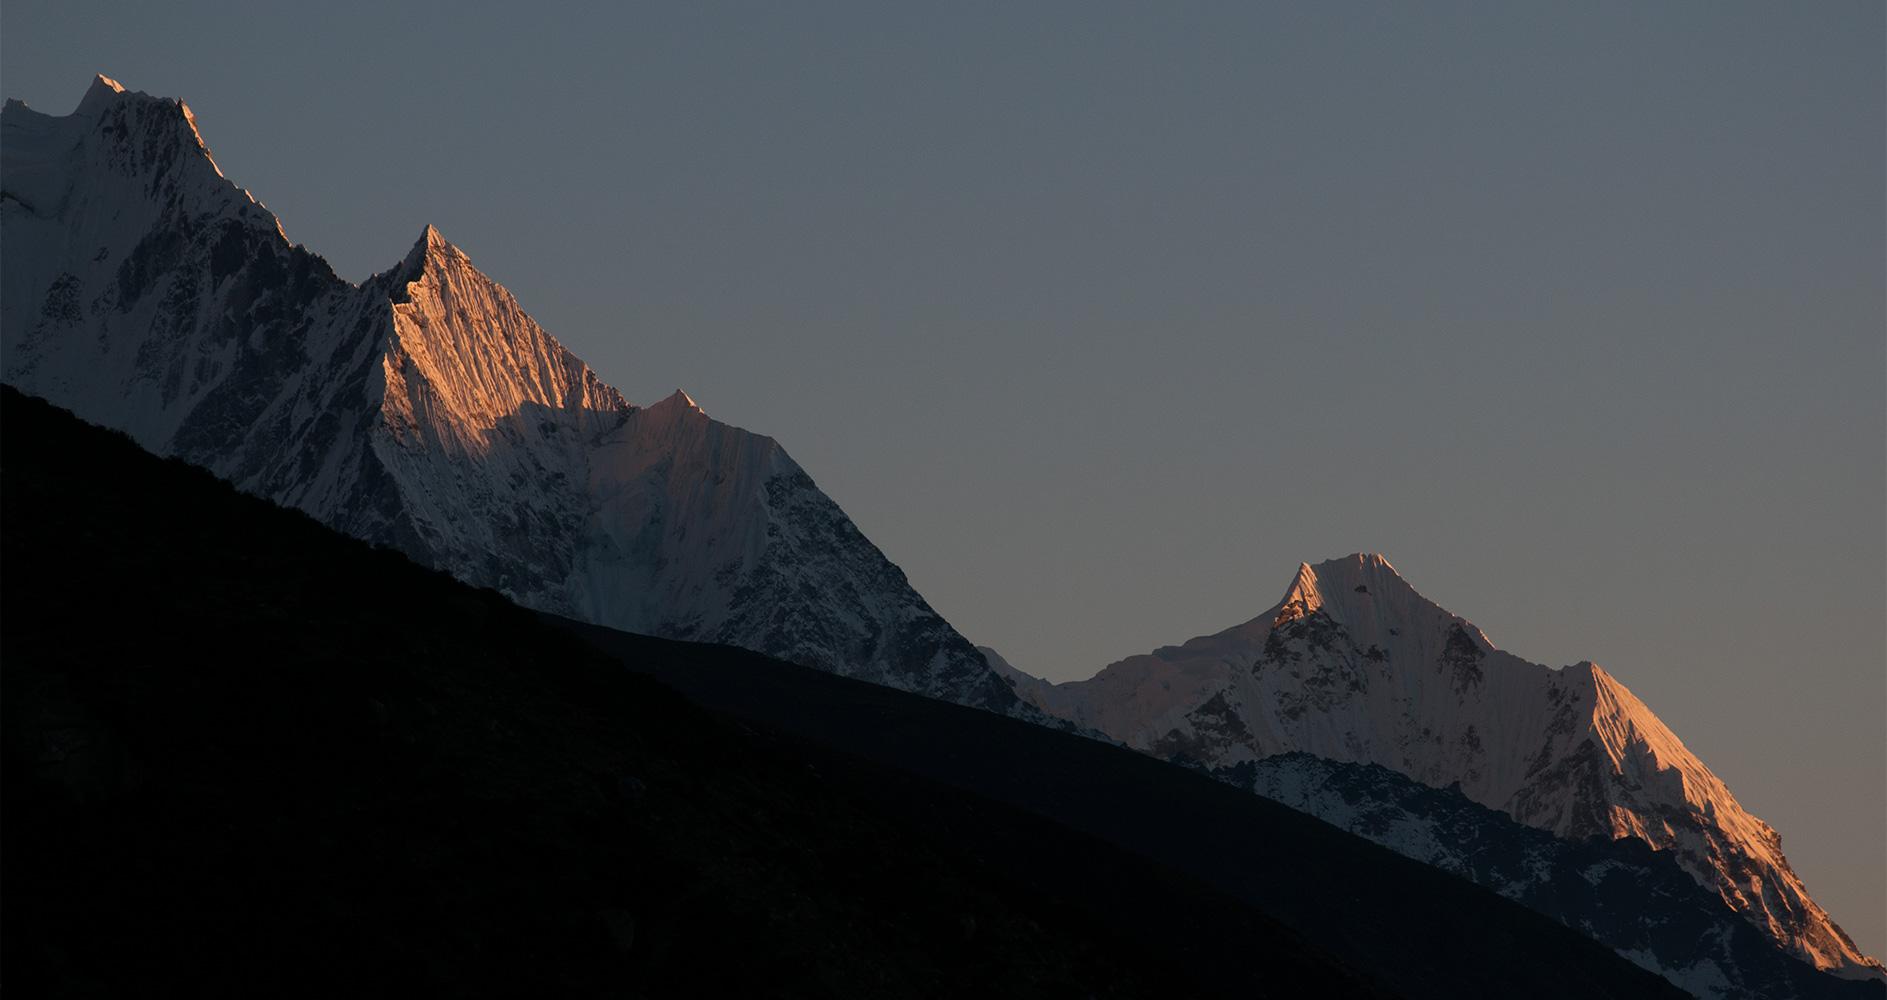 RAZ_0328_5897_dragnag-sunset